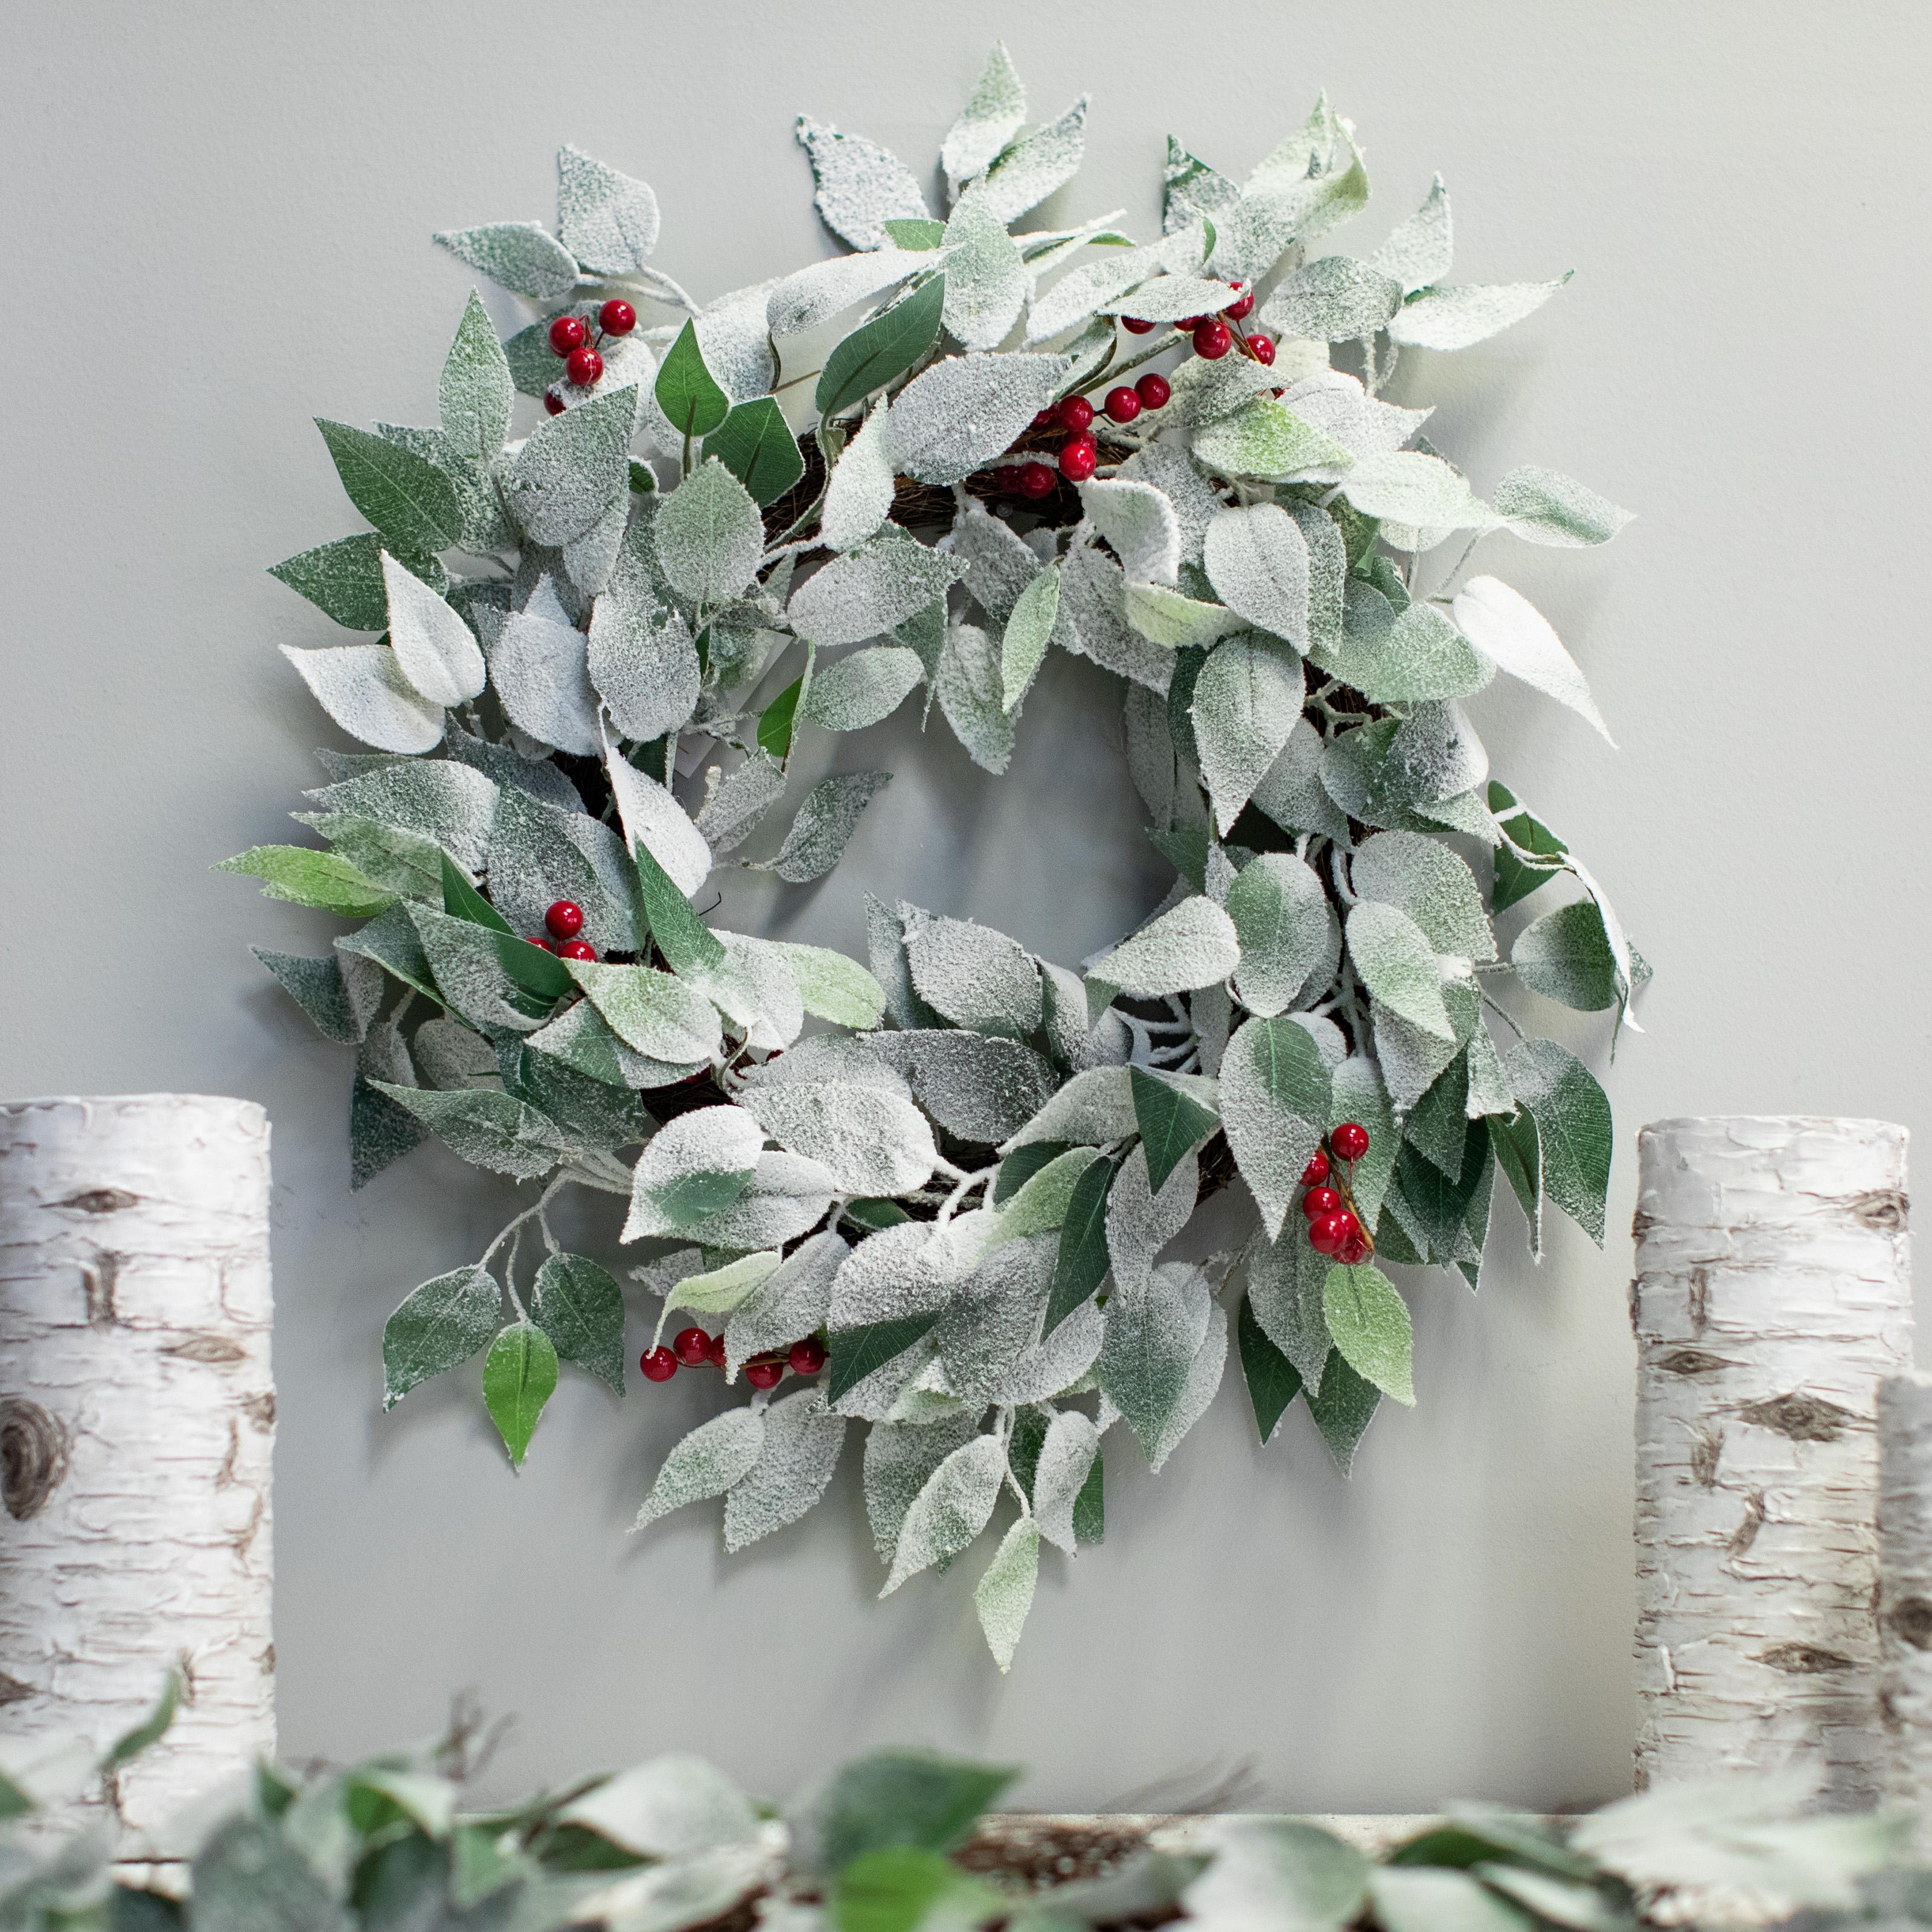 Belham Living 24inch Sierra Berry Wreath